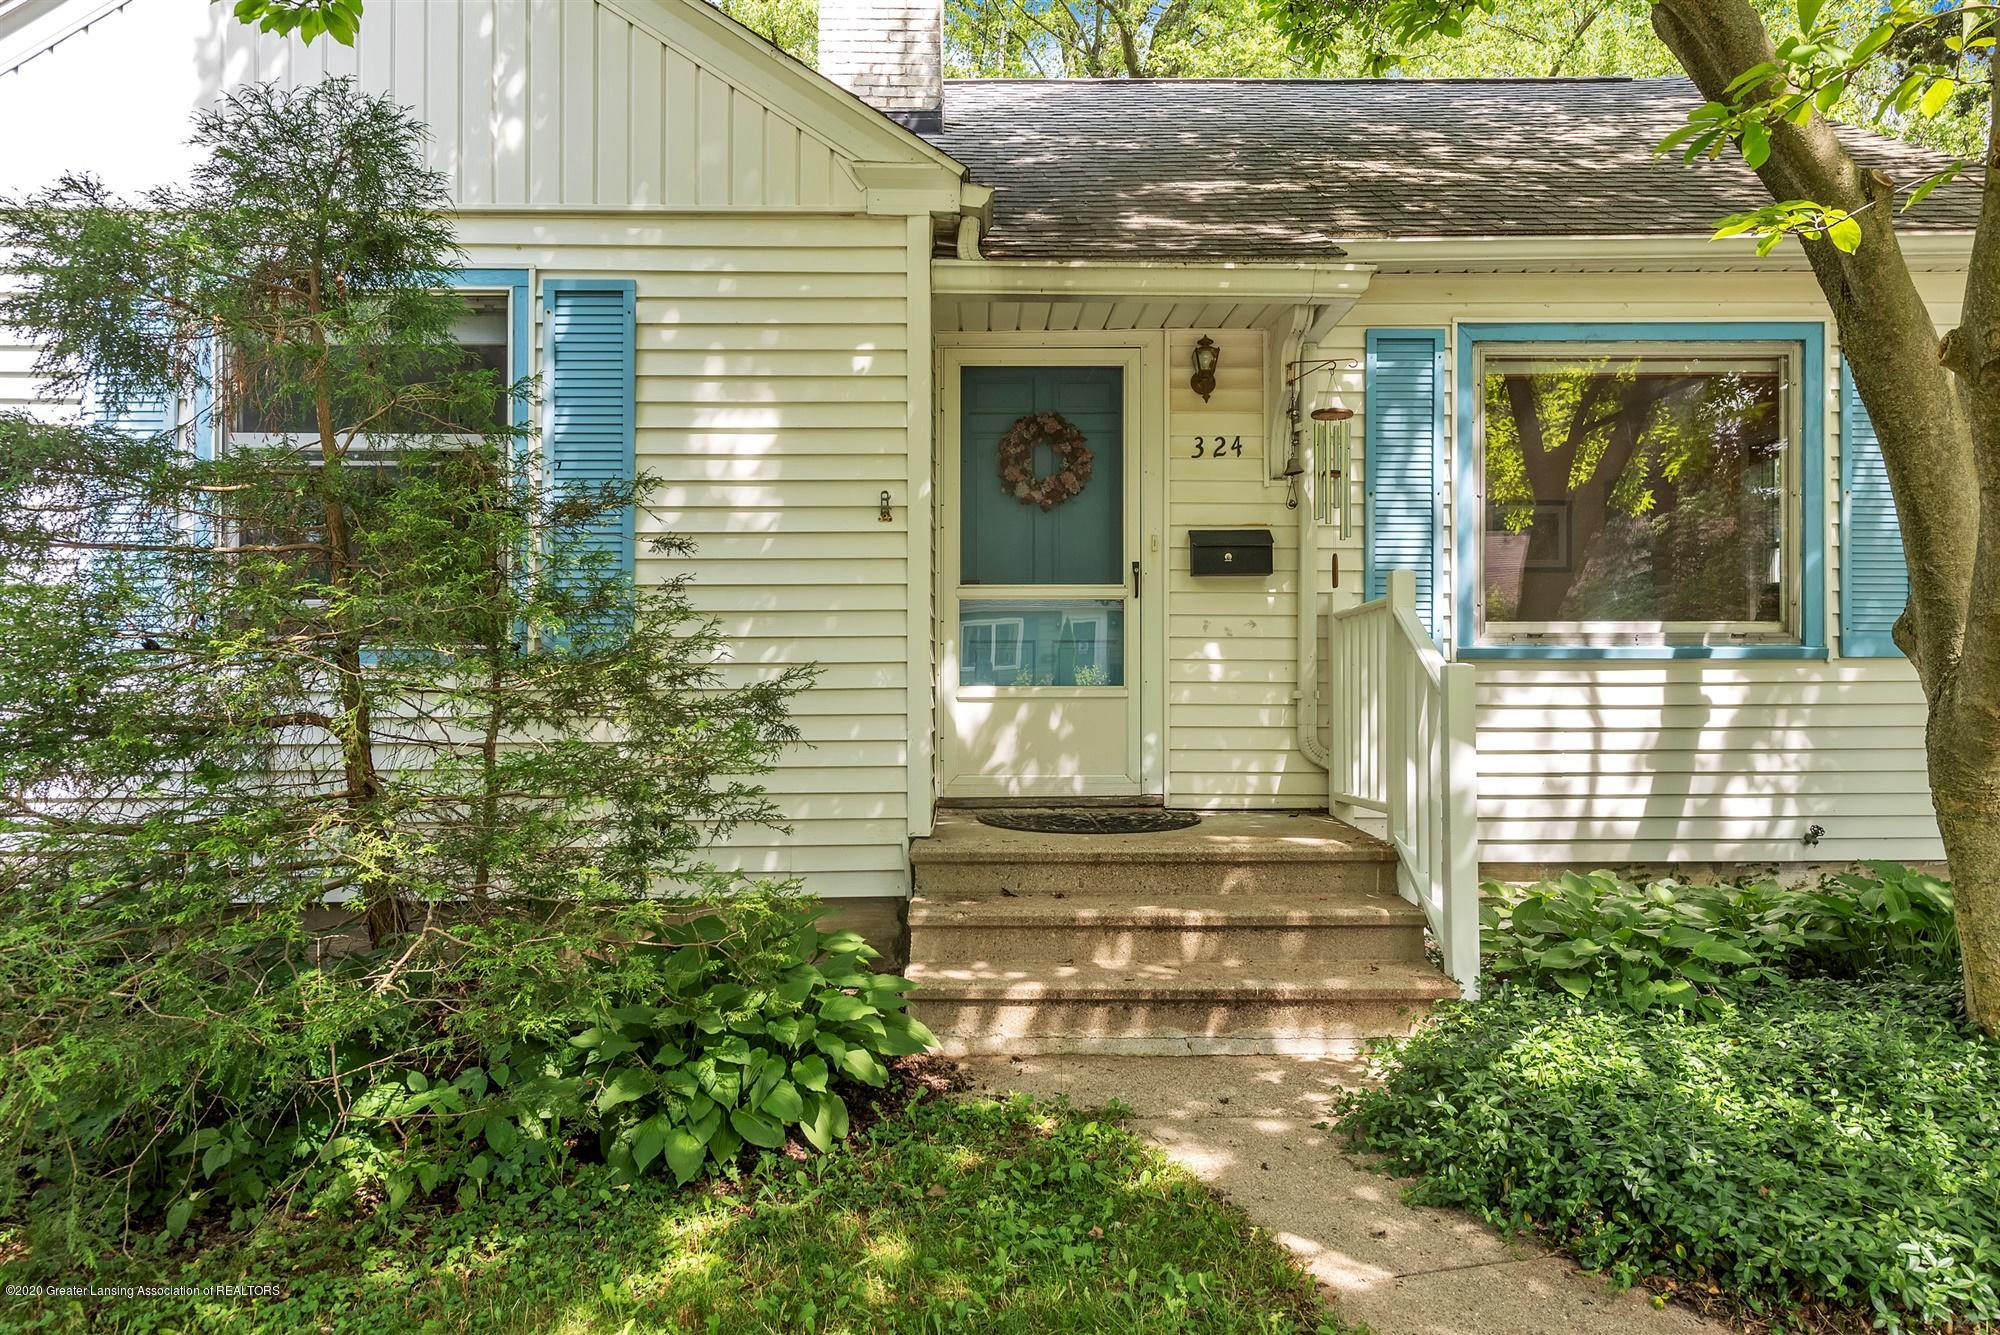 324 Highland Ave - 05-324 Highland Ave-WindowStill-Rea - 3